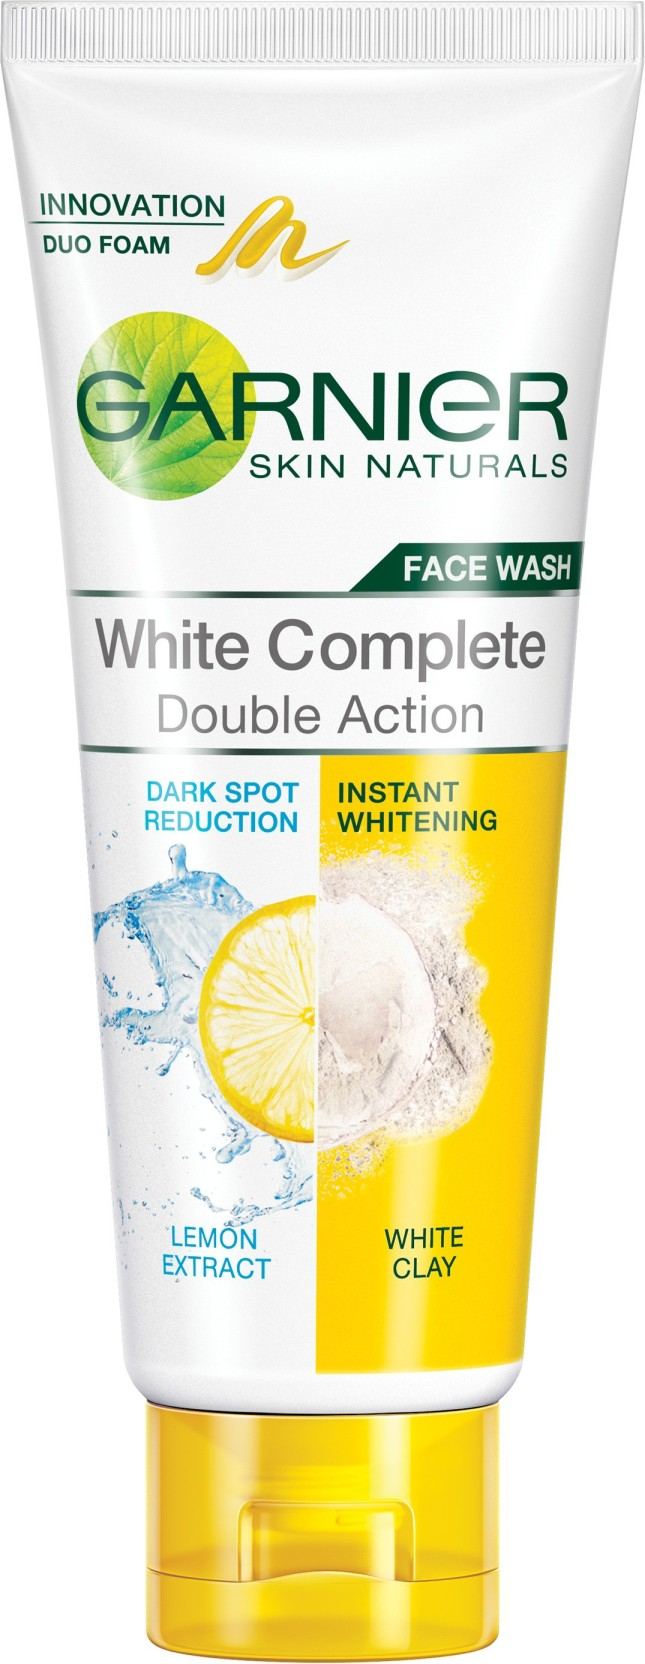 Garnier Skin Naturals White Complete Double Action Face Wash Price Light Speed Super Foam 10 100ml Add To Cart